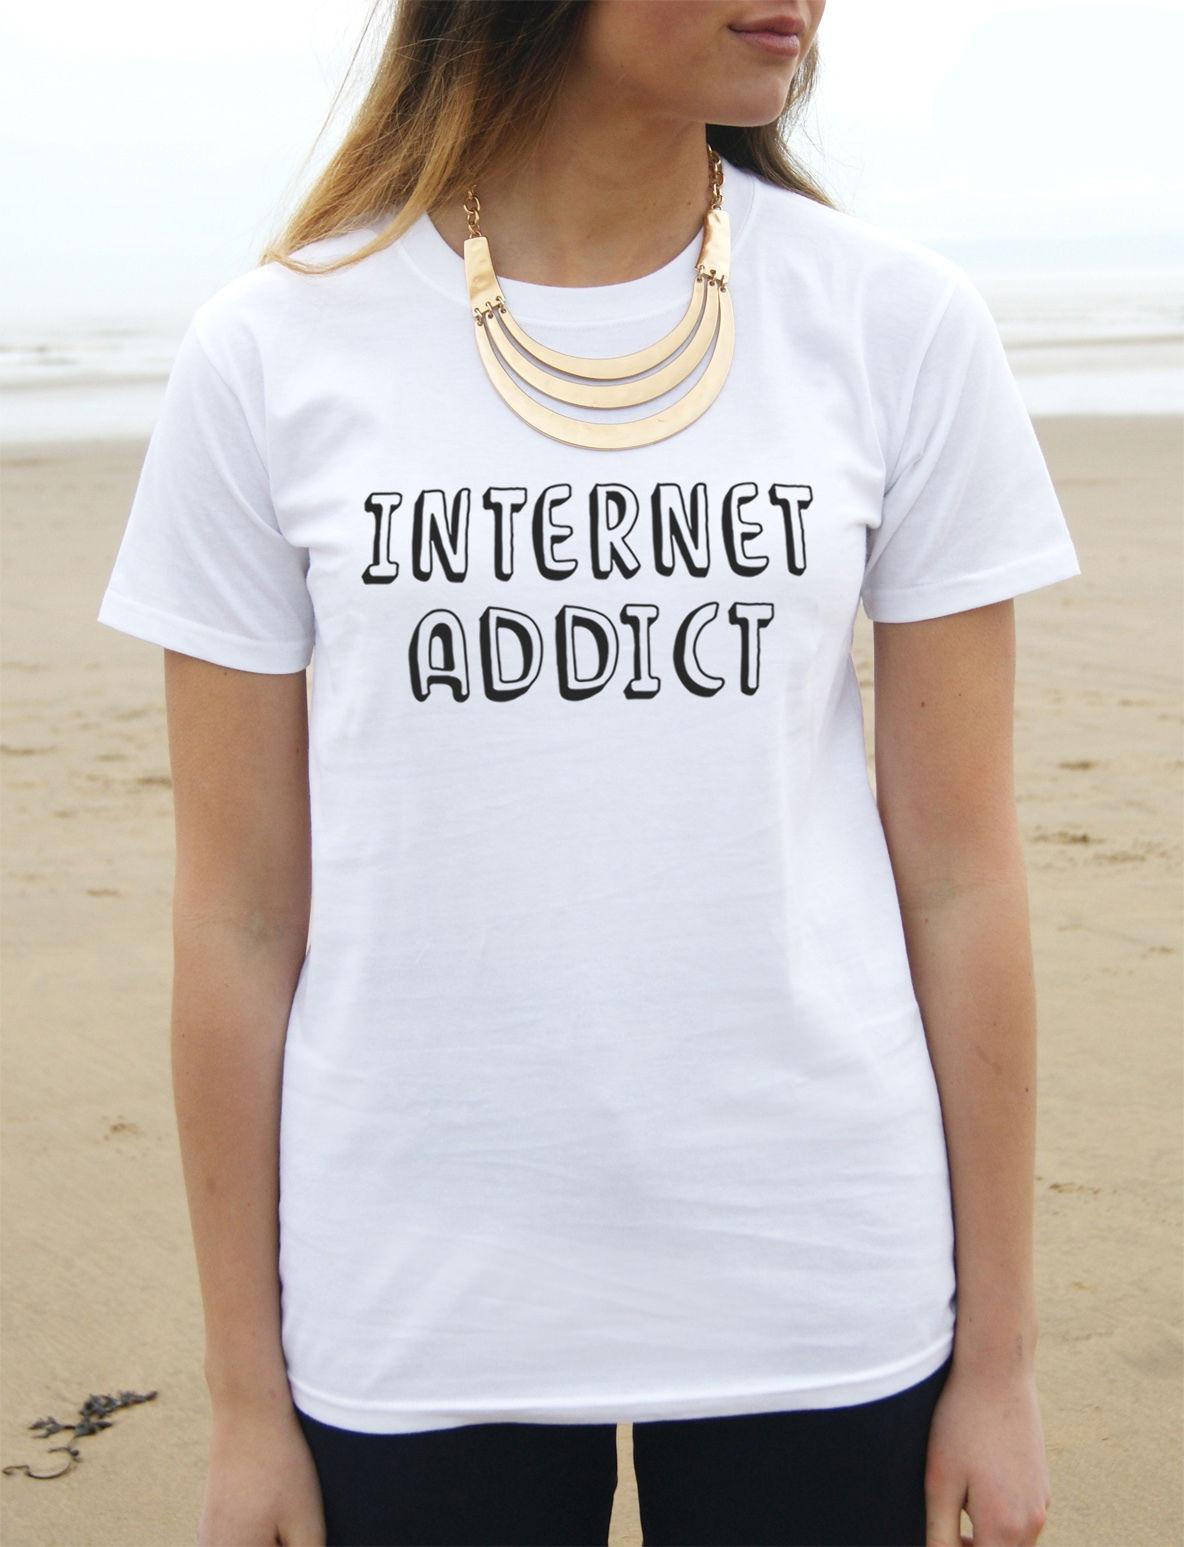 * INTERNET ADDICT T-shirt Top Tumblr Fashion Funny Slogan Hipster Wifi Love *